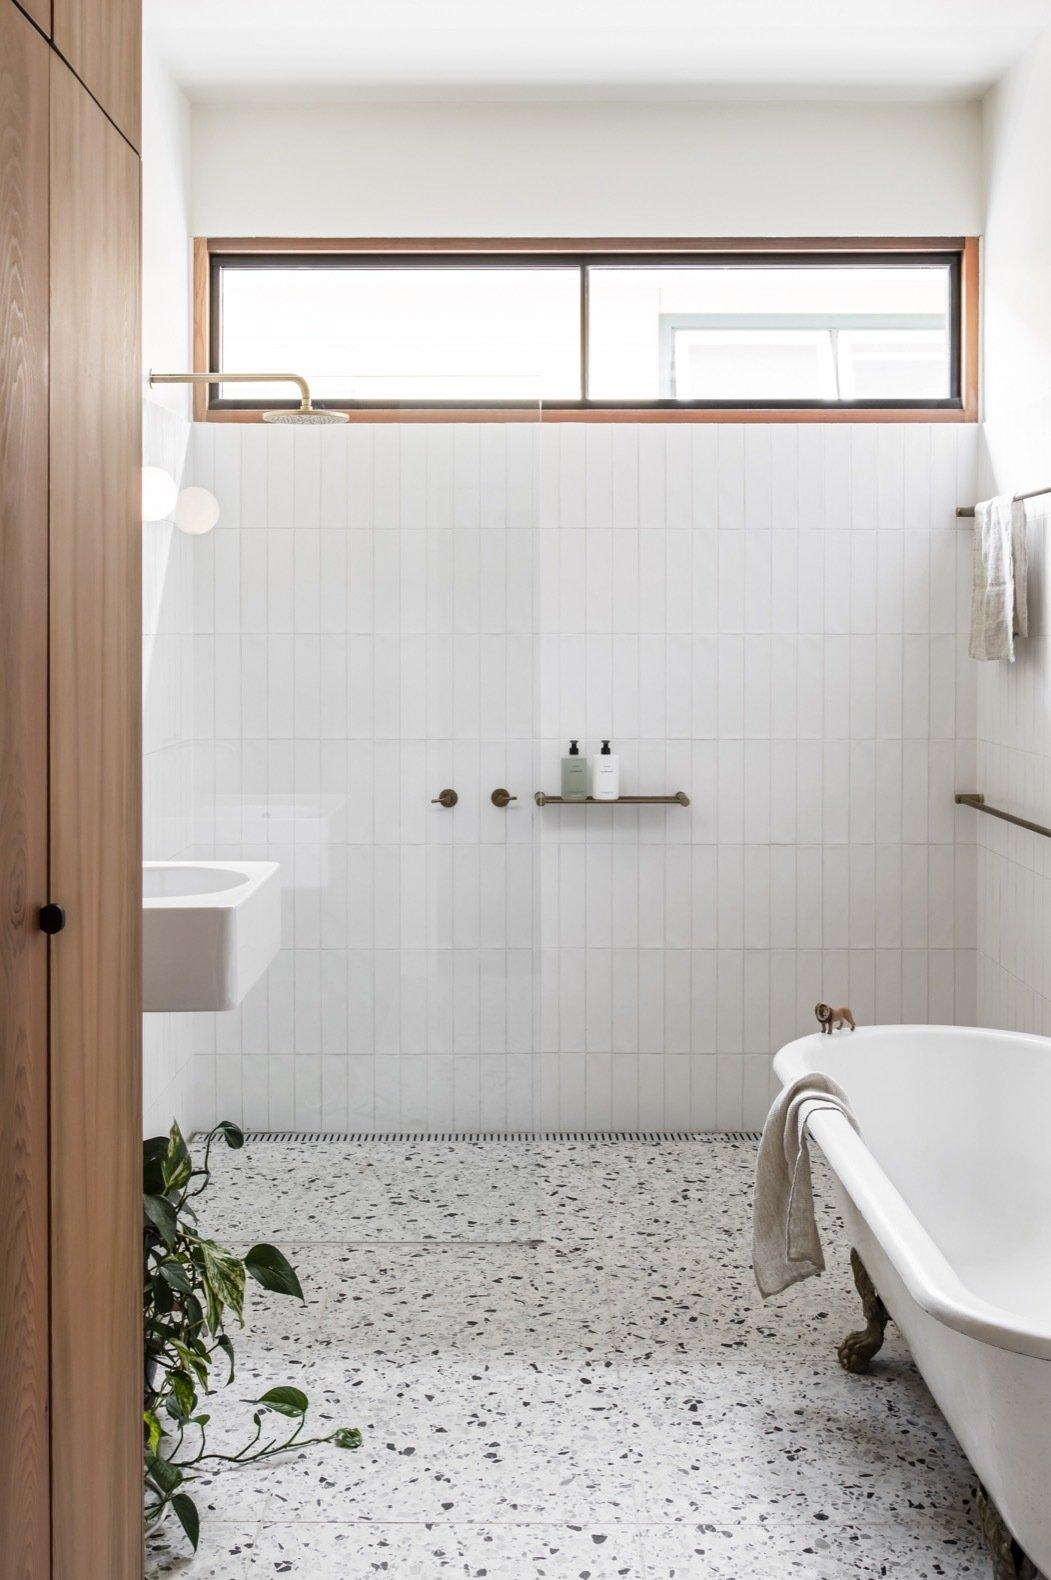 Northcote House bathroom